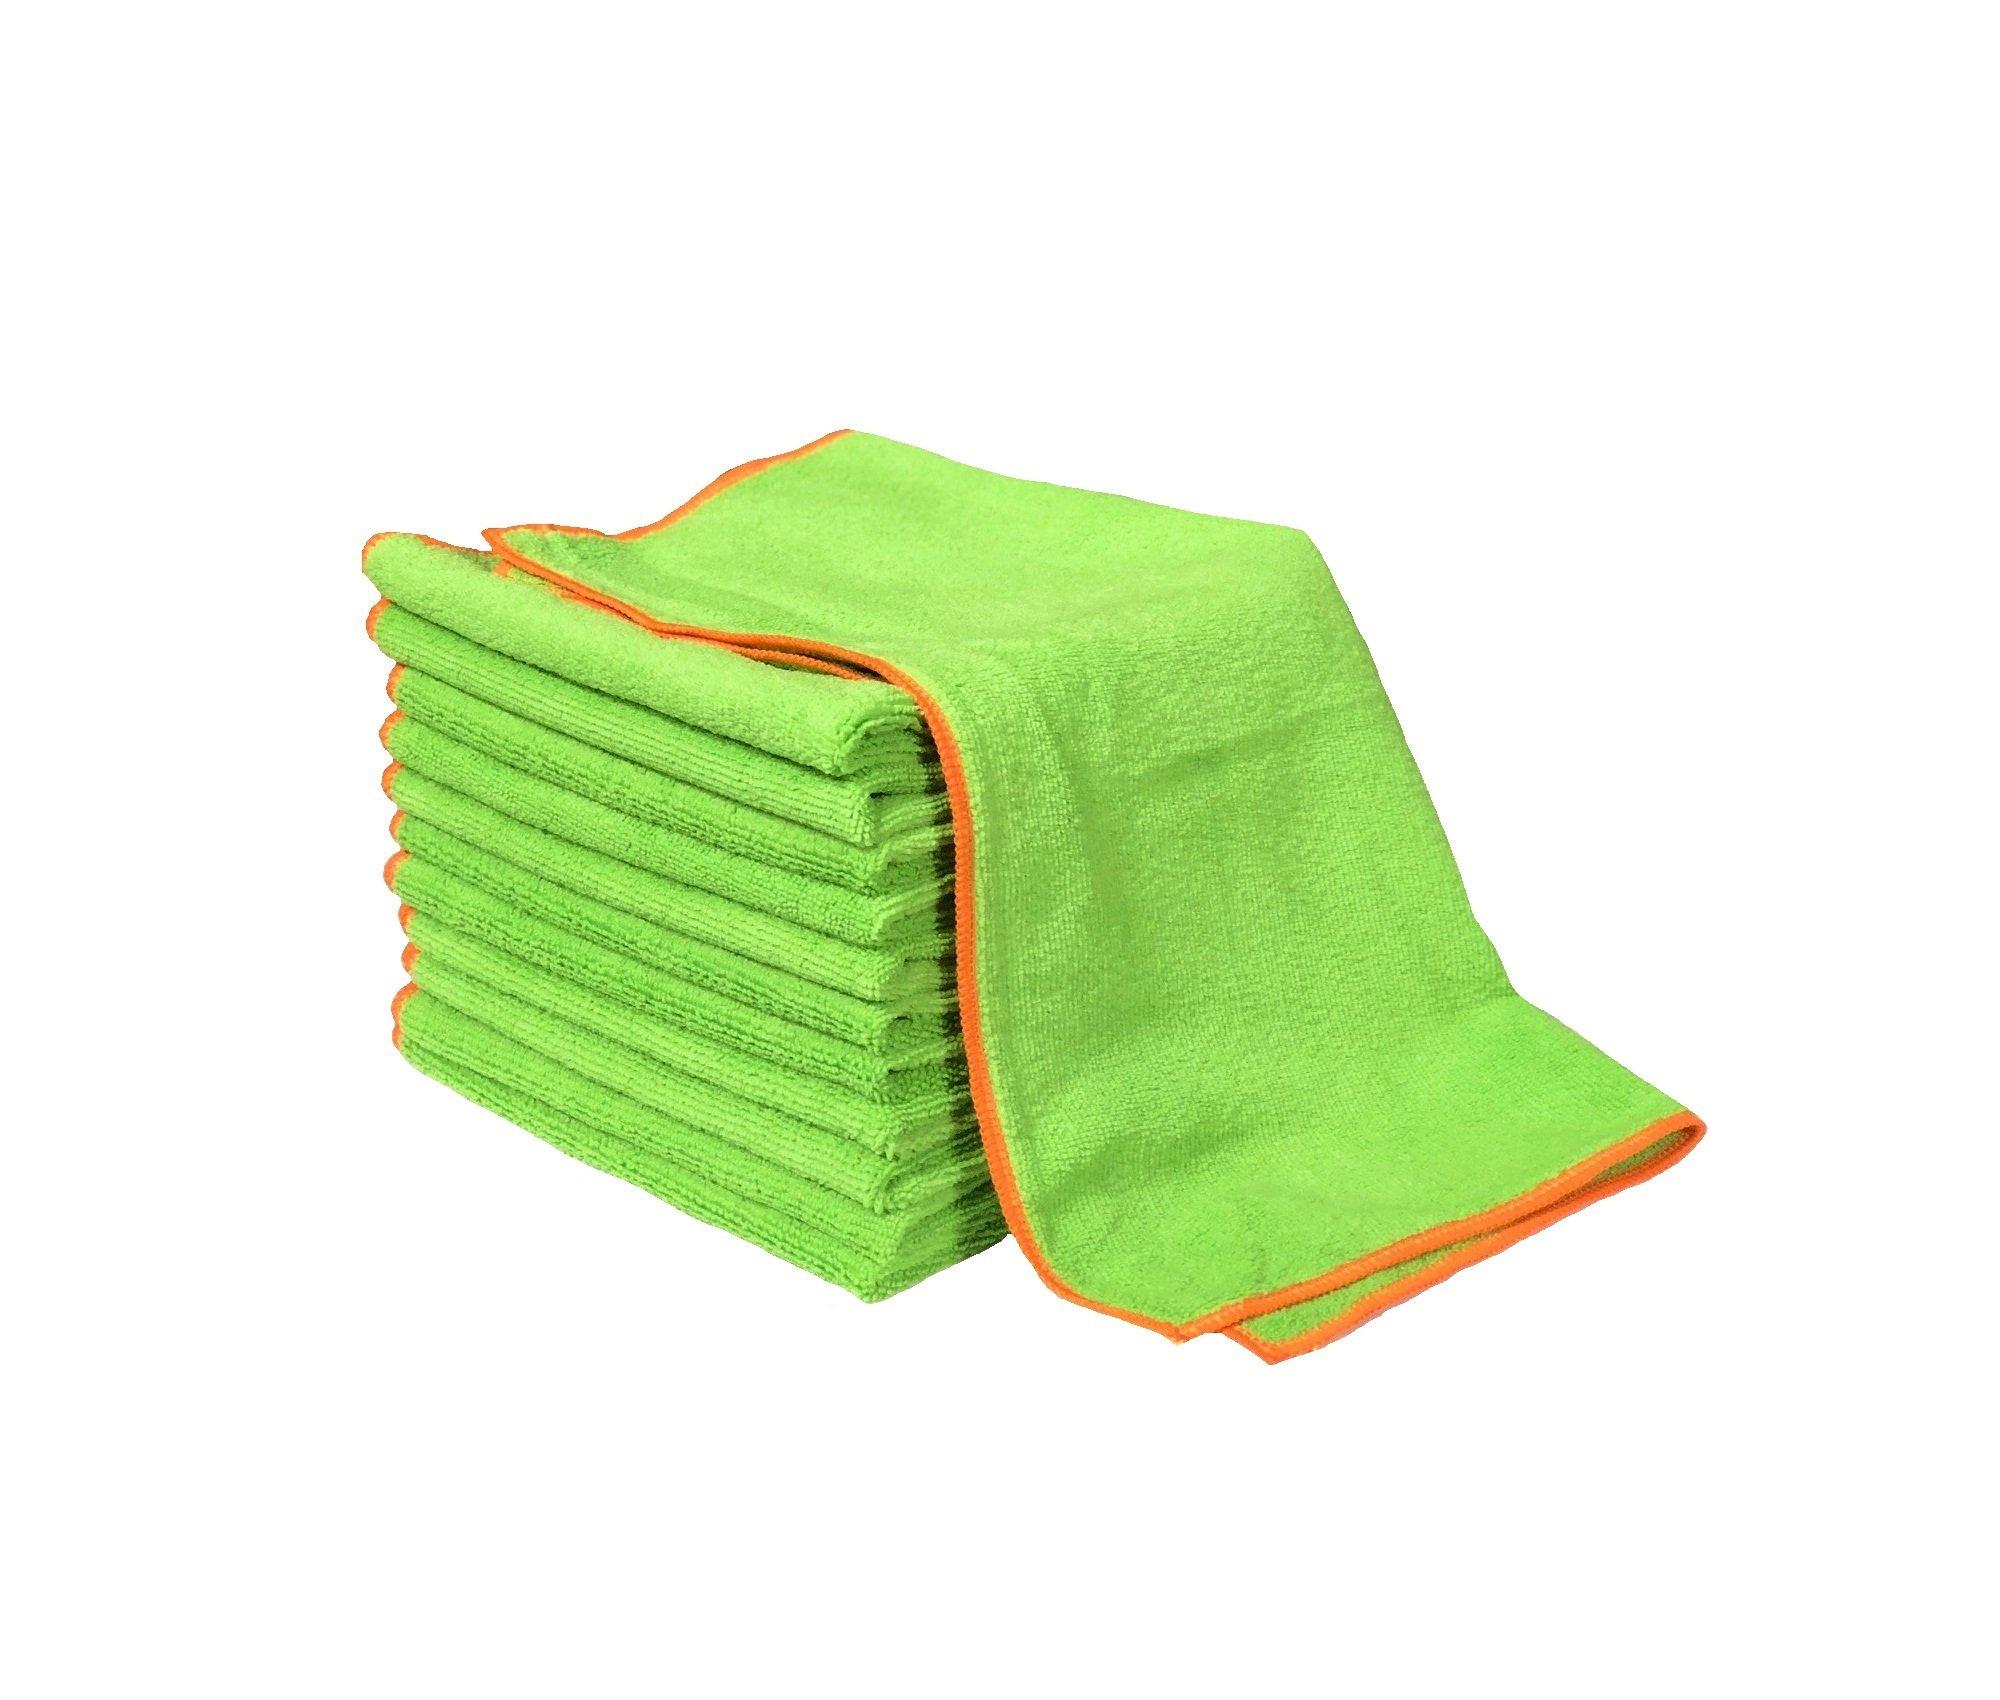 Silver Killer Green Antibacterial Microfiber Cloth 16 x 16 Towel (Pack of 12) by Real Clean